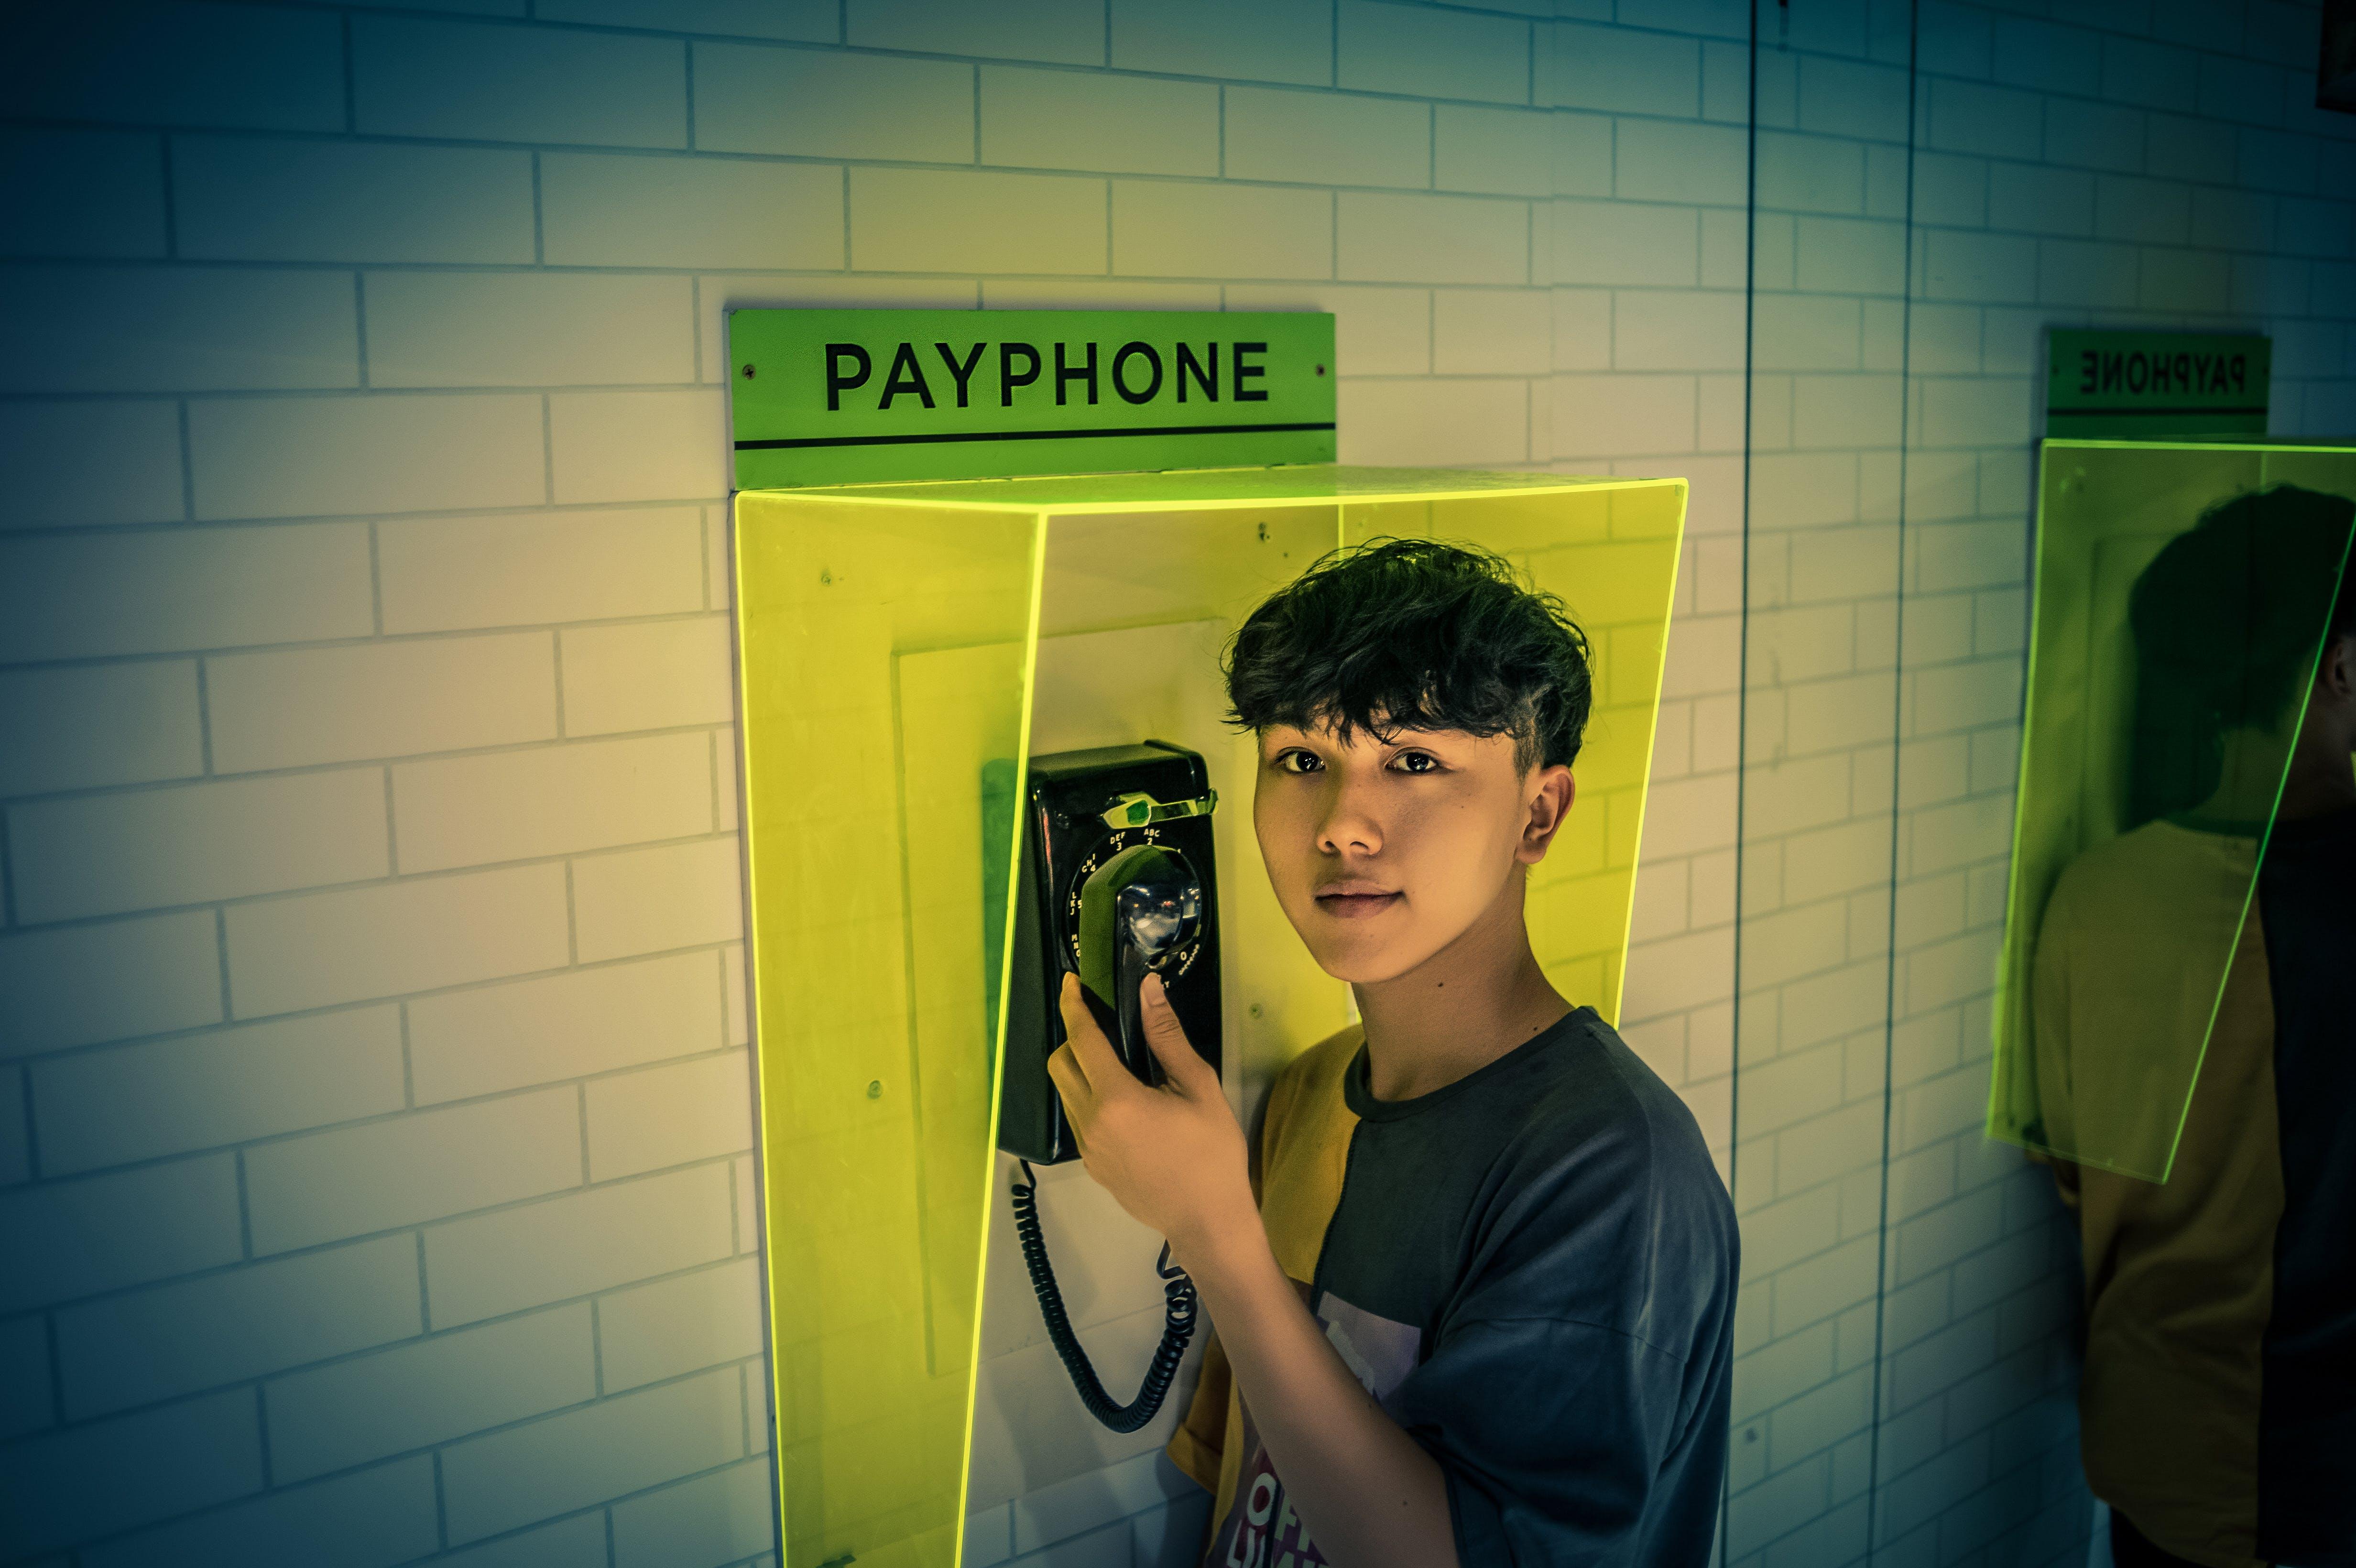 Man Holding Telephone